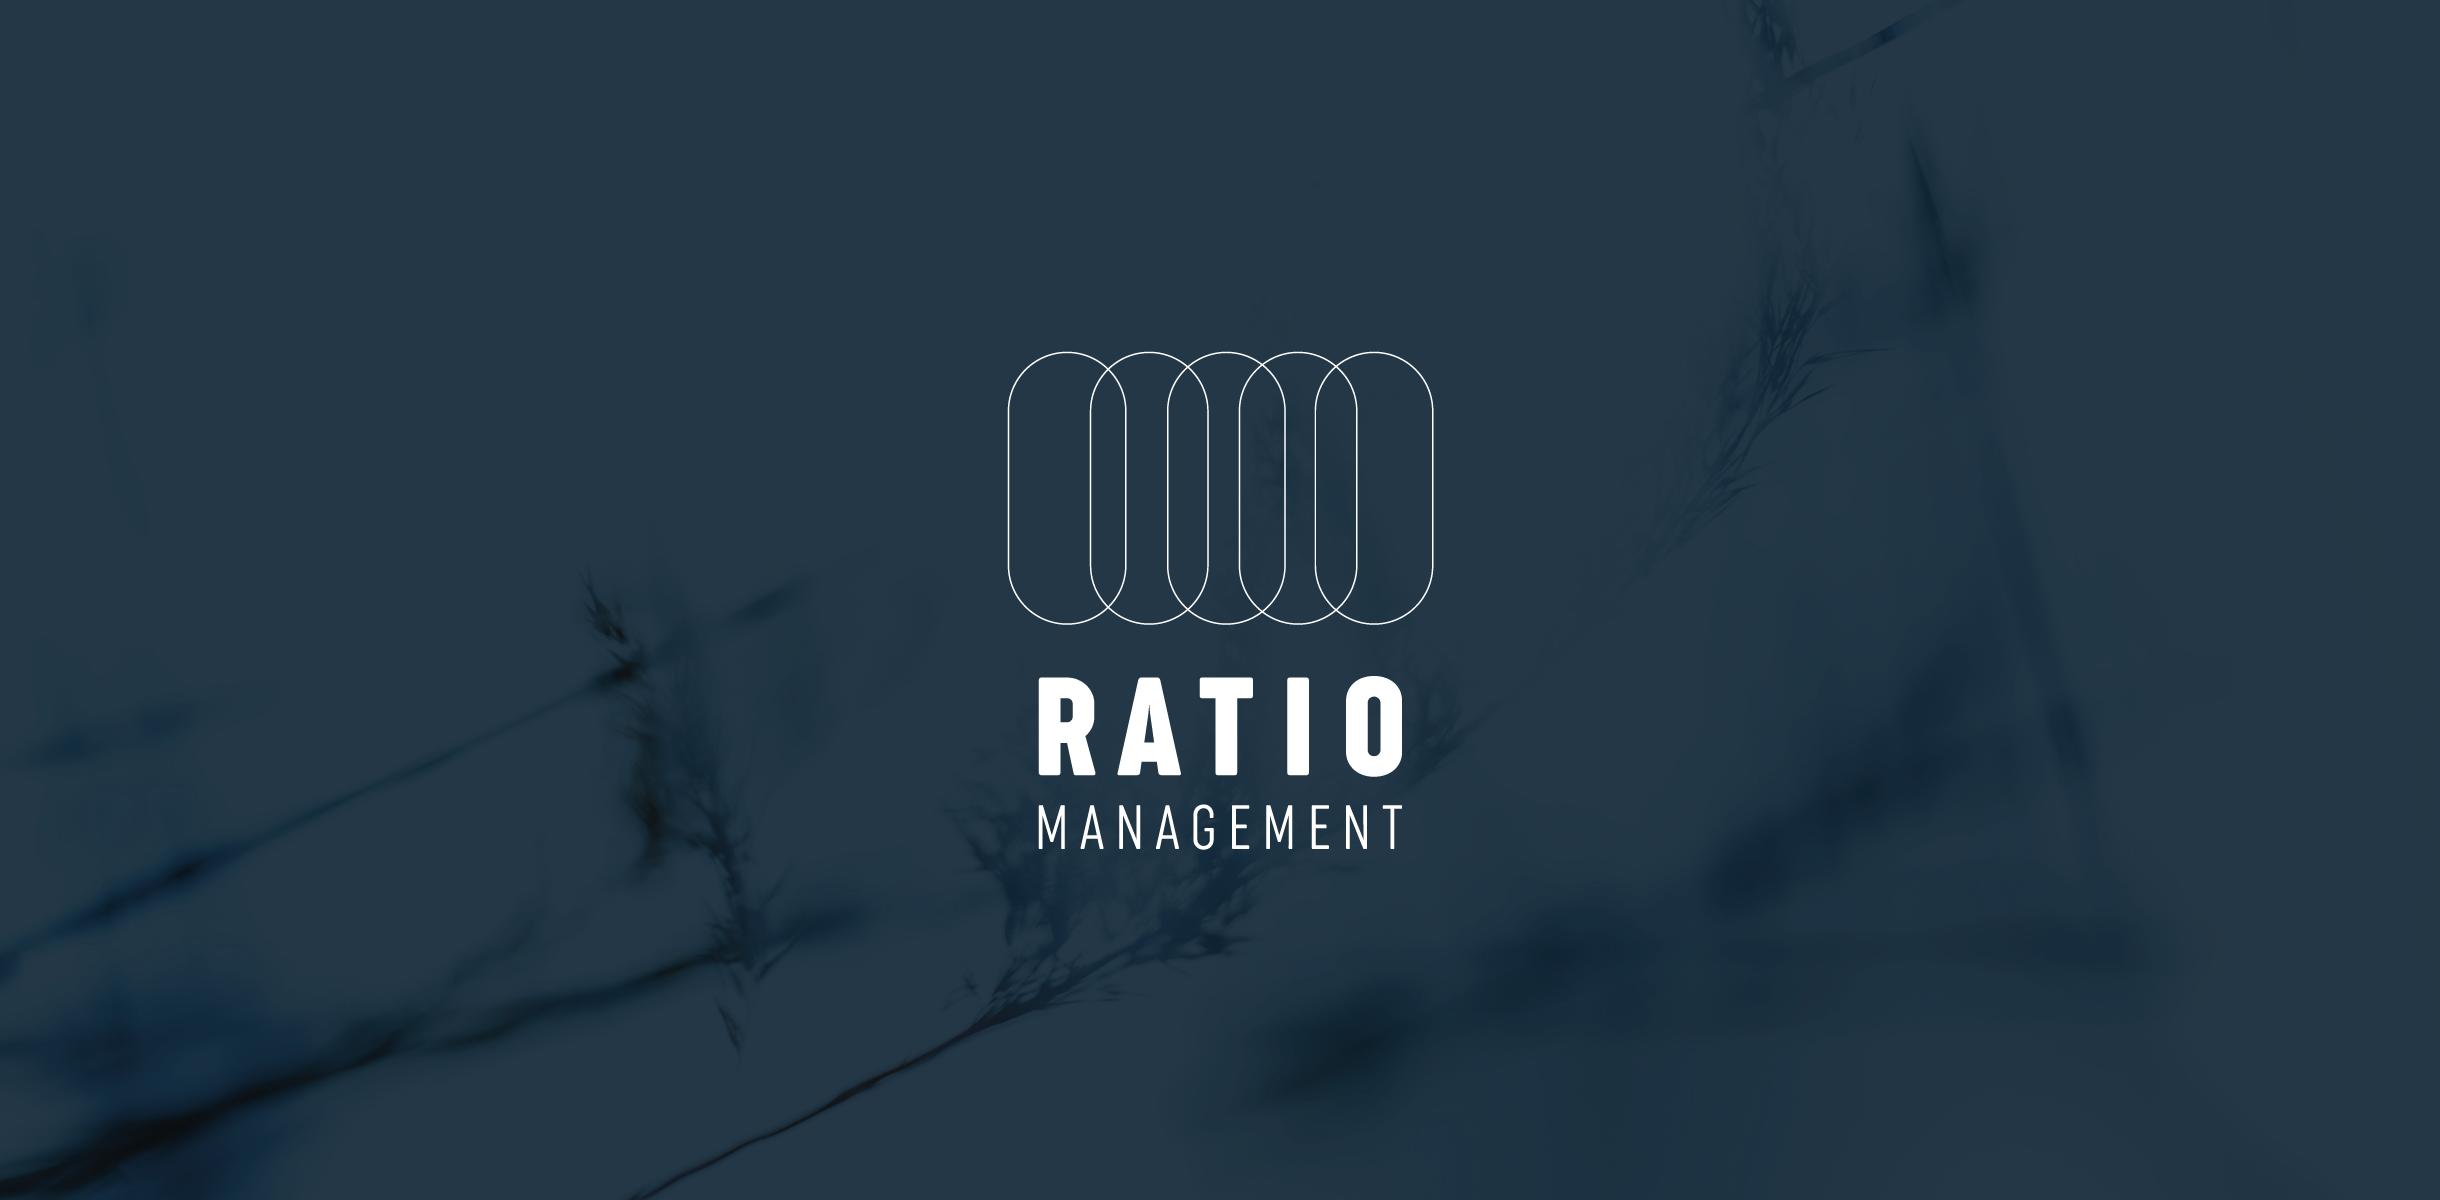 Ratio Management mood